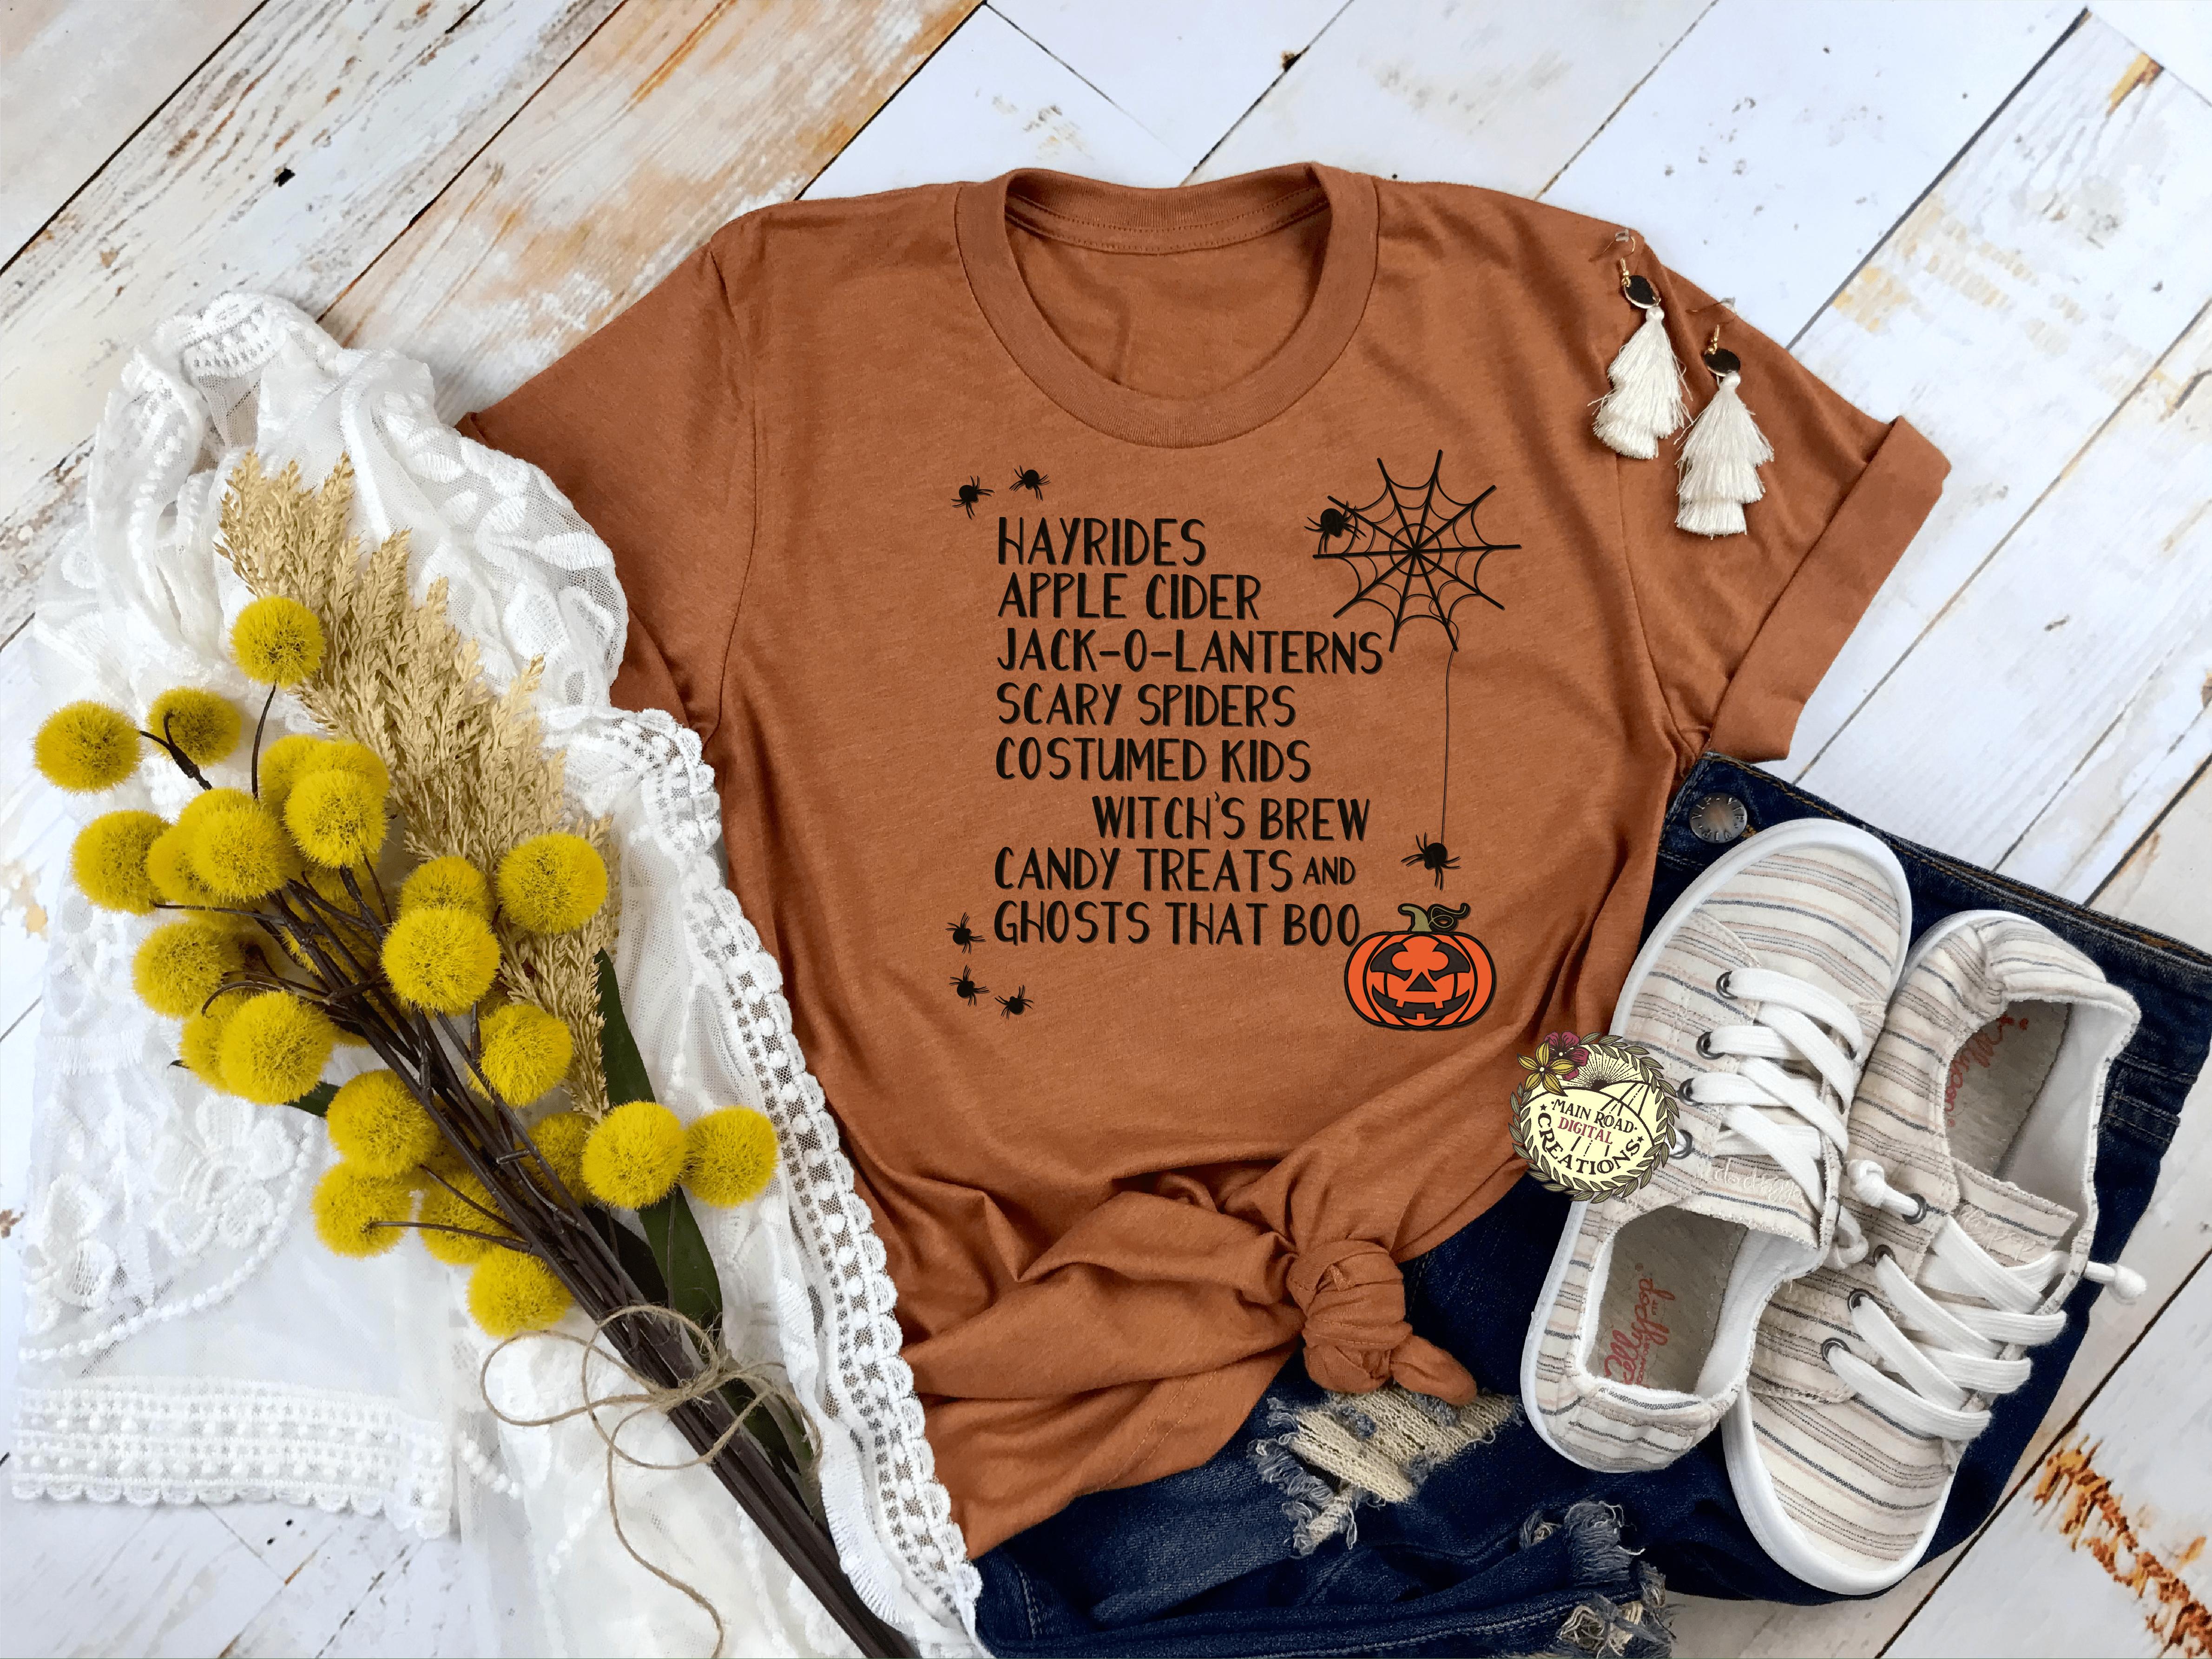 halloween svg free, free fall designs, svg designs for tshirts, jack-o-lantern svg free, pumpkin svg, hayrides